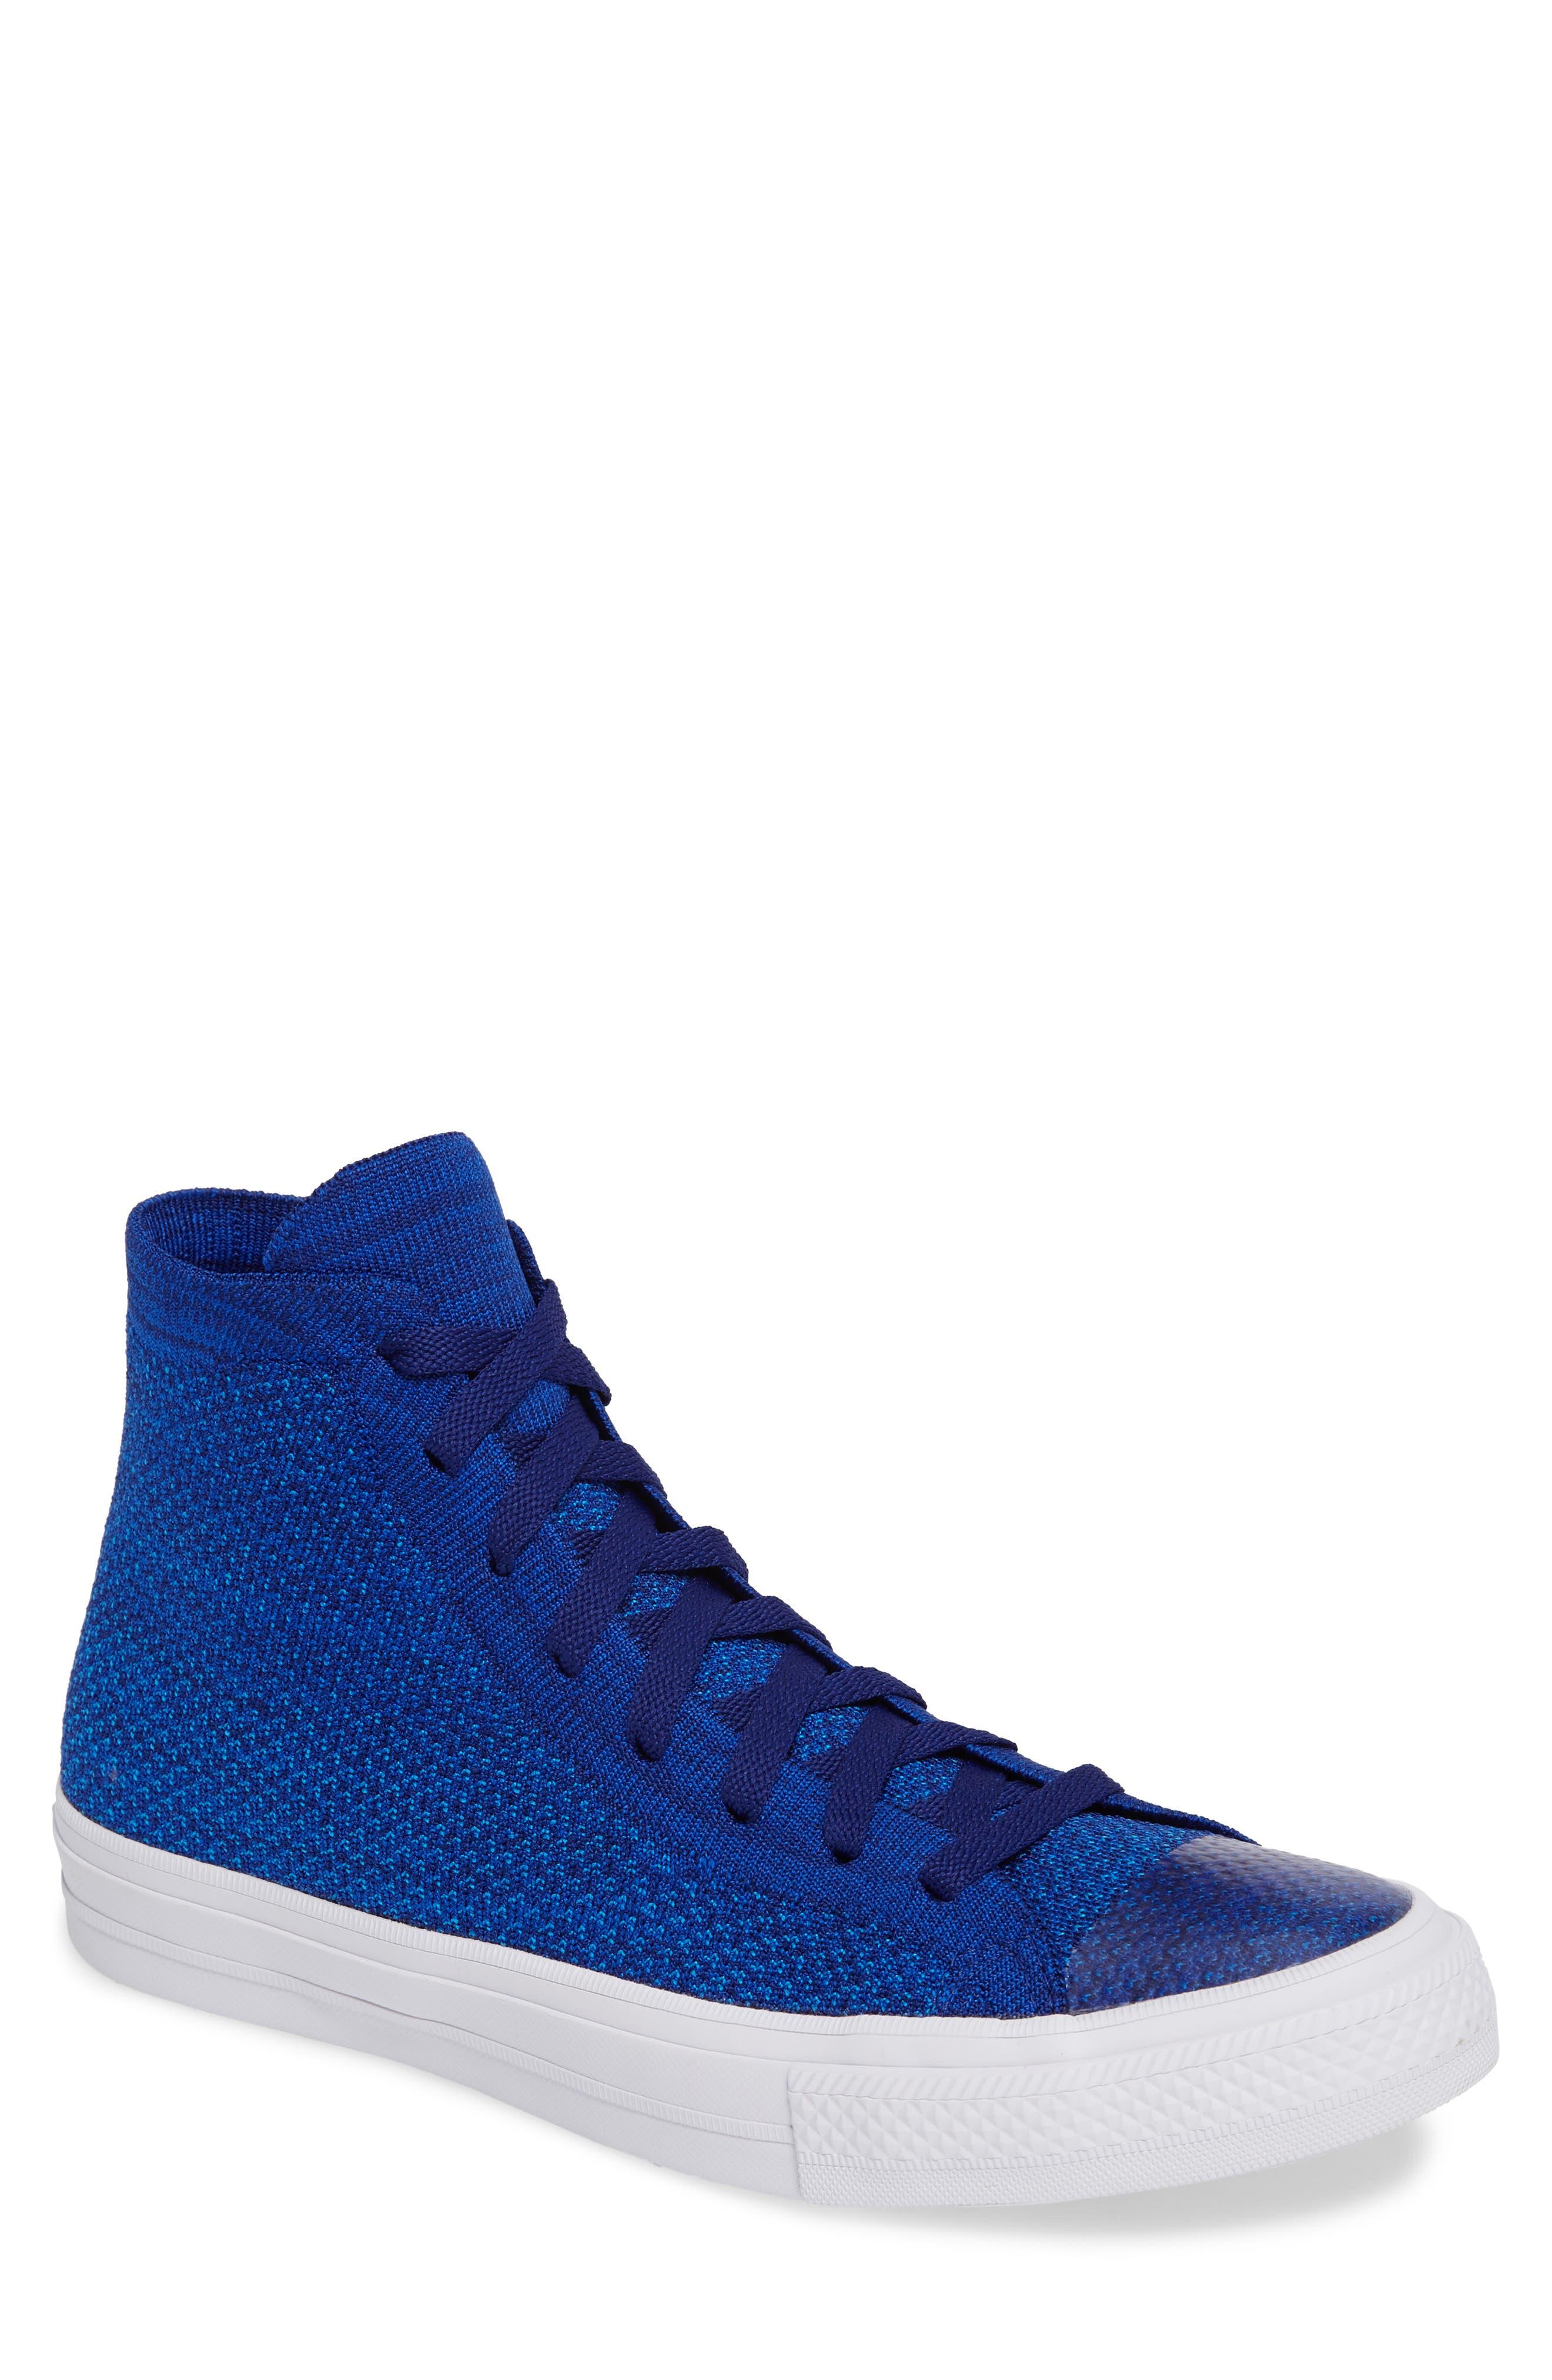 Chuck Taylor<sup>®</sup> All Star<sup>®</sup> Flyknit Hi Sneaker,                             Main thumbnail 5, color,